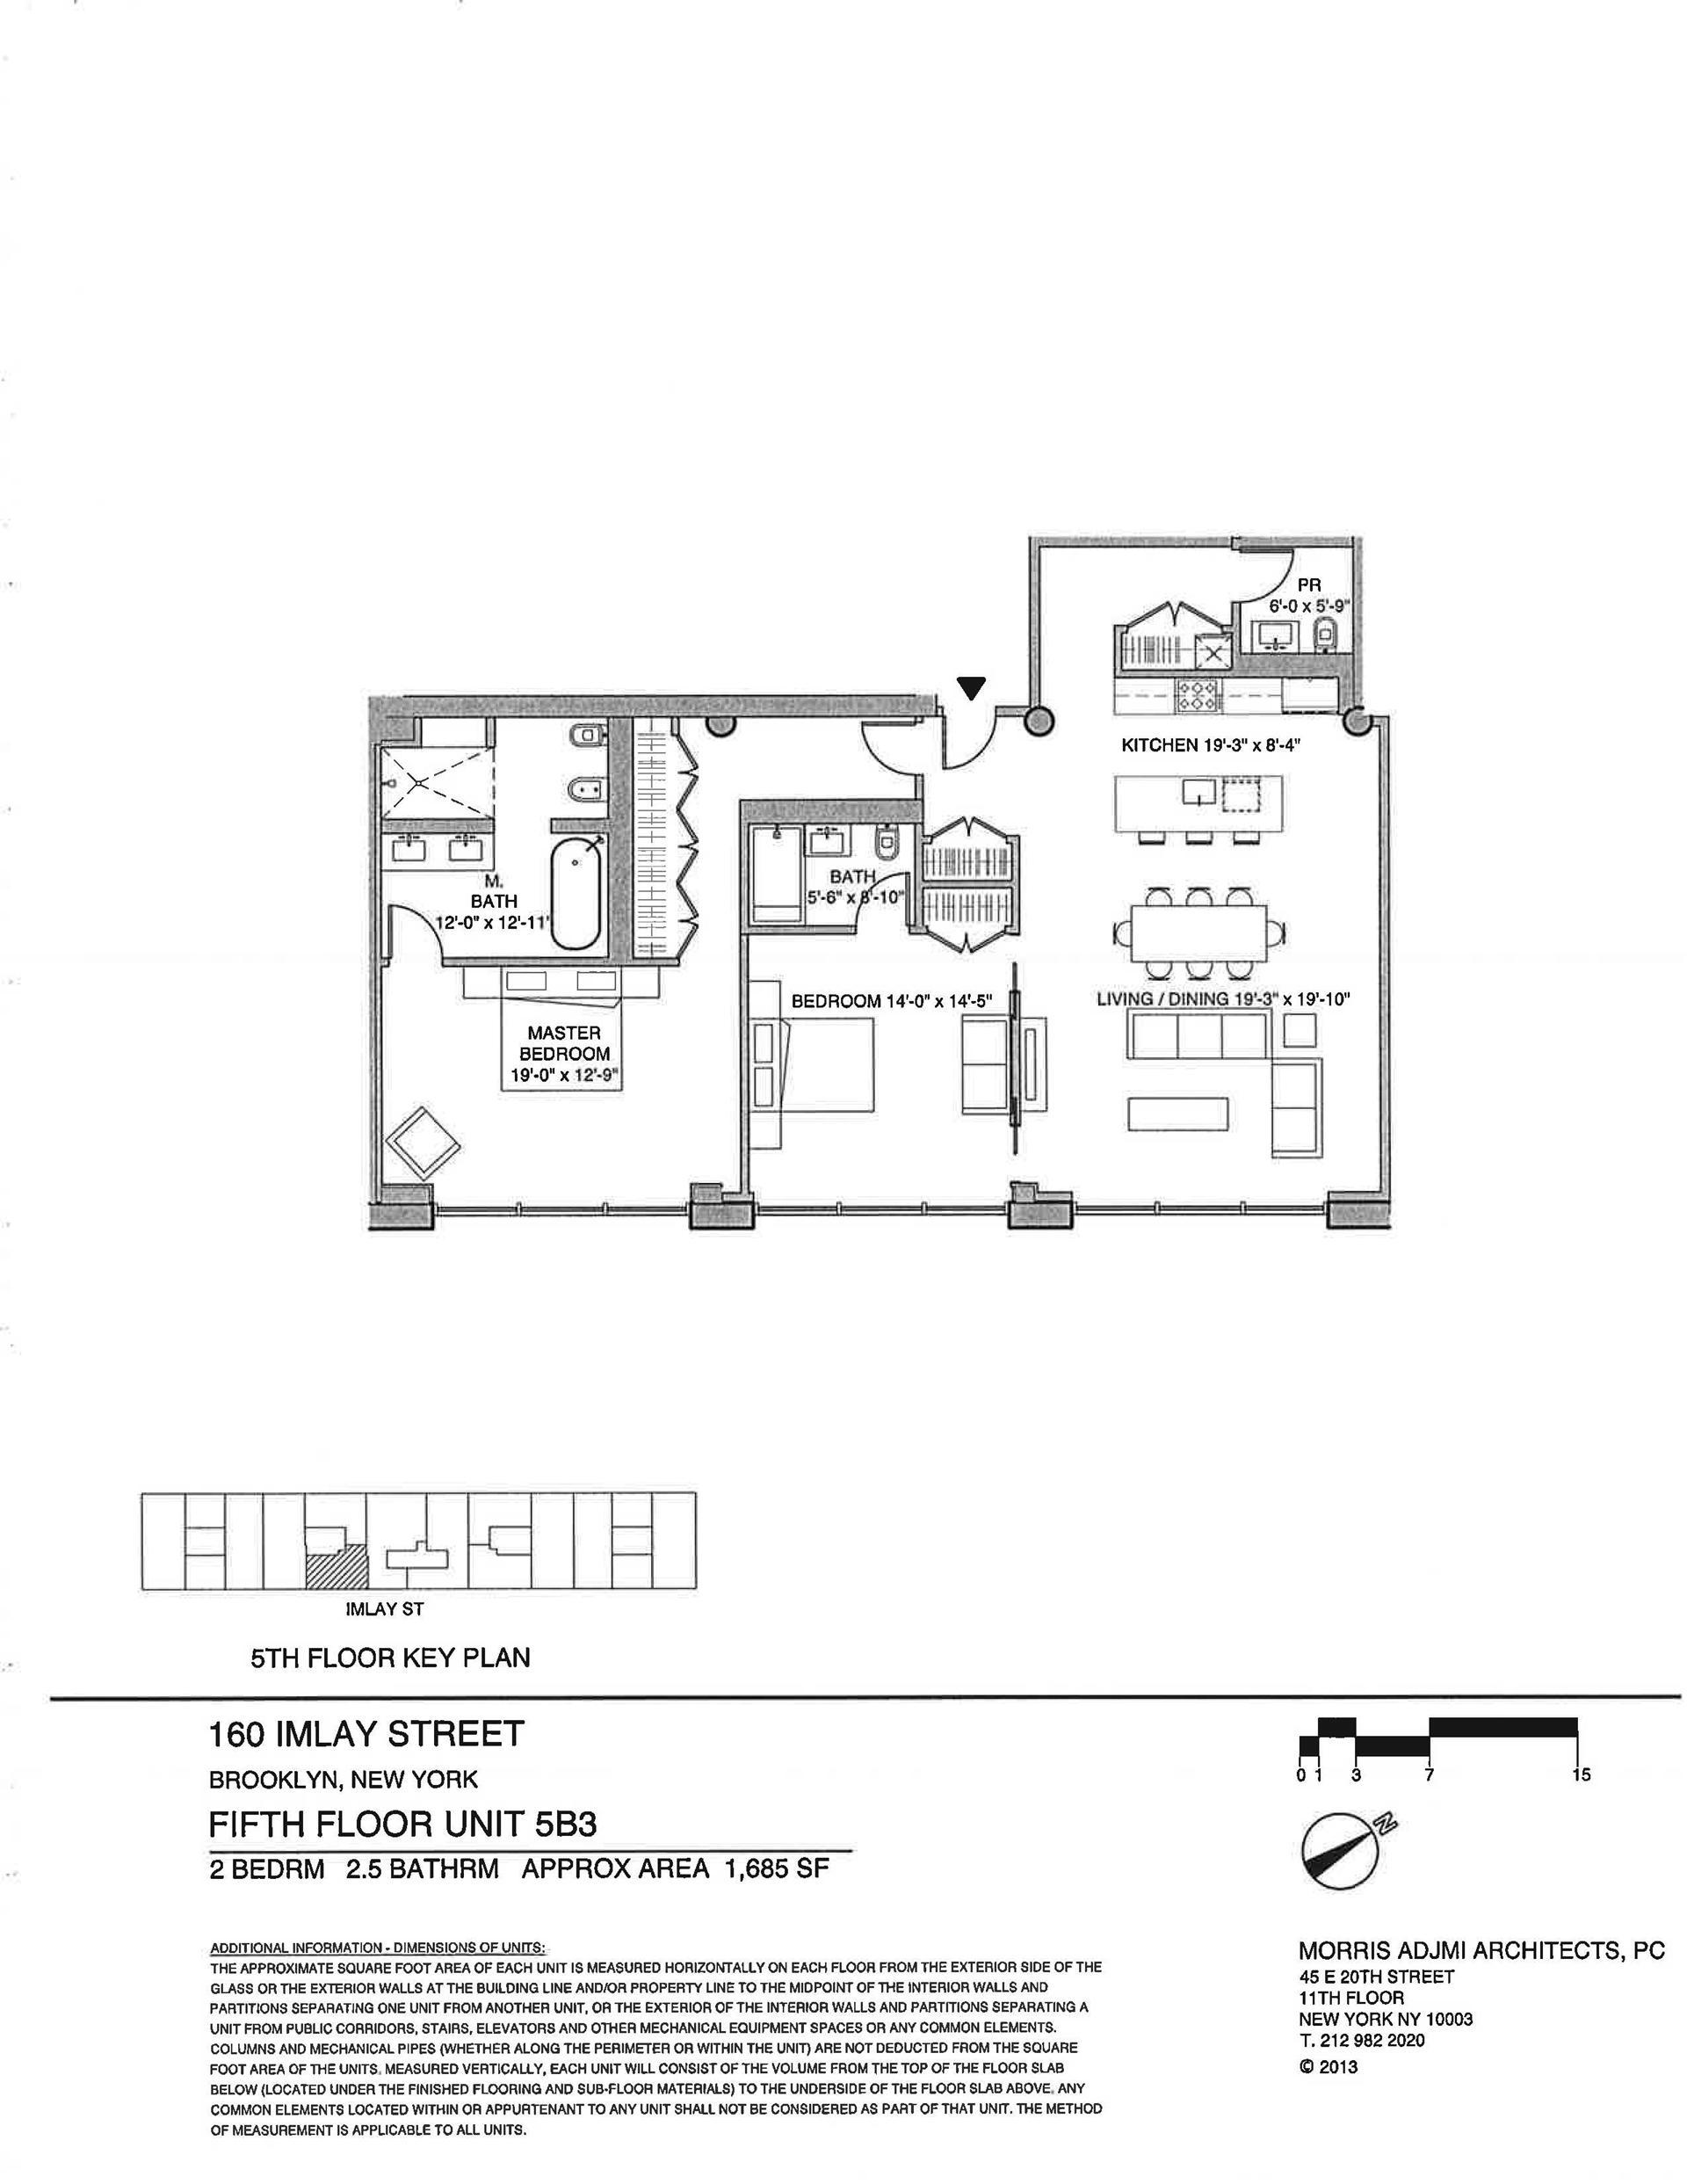 Floor plan of The New York Dock Building, 160 Imlay St, 5B3 - Red Hook, New York